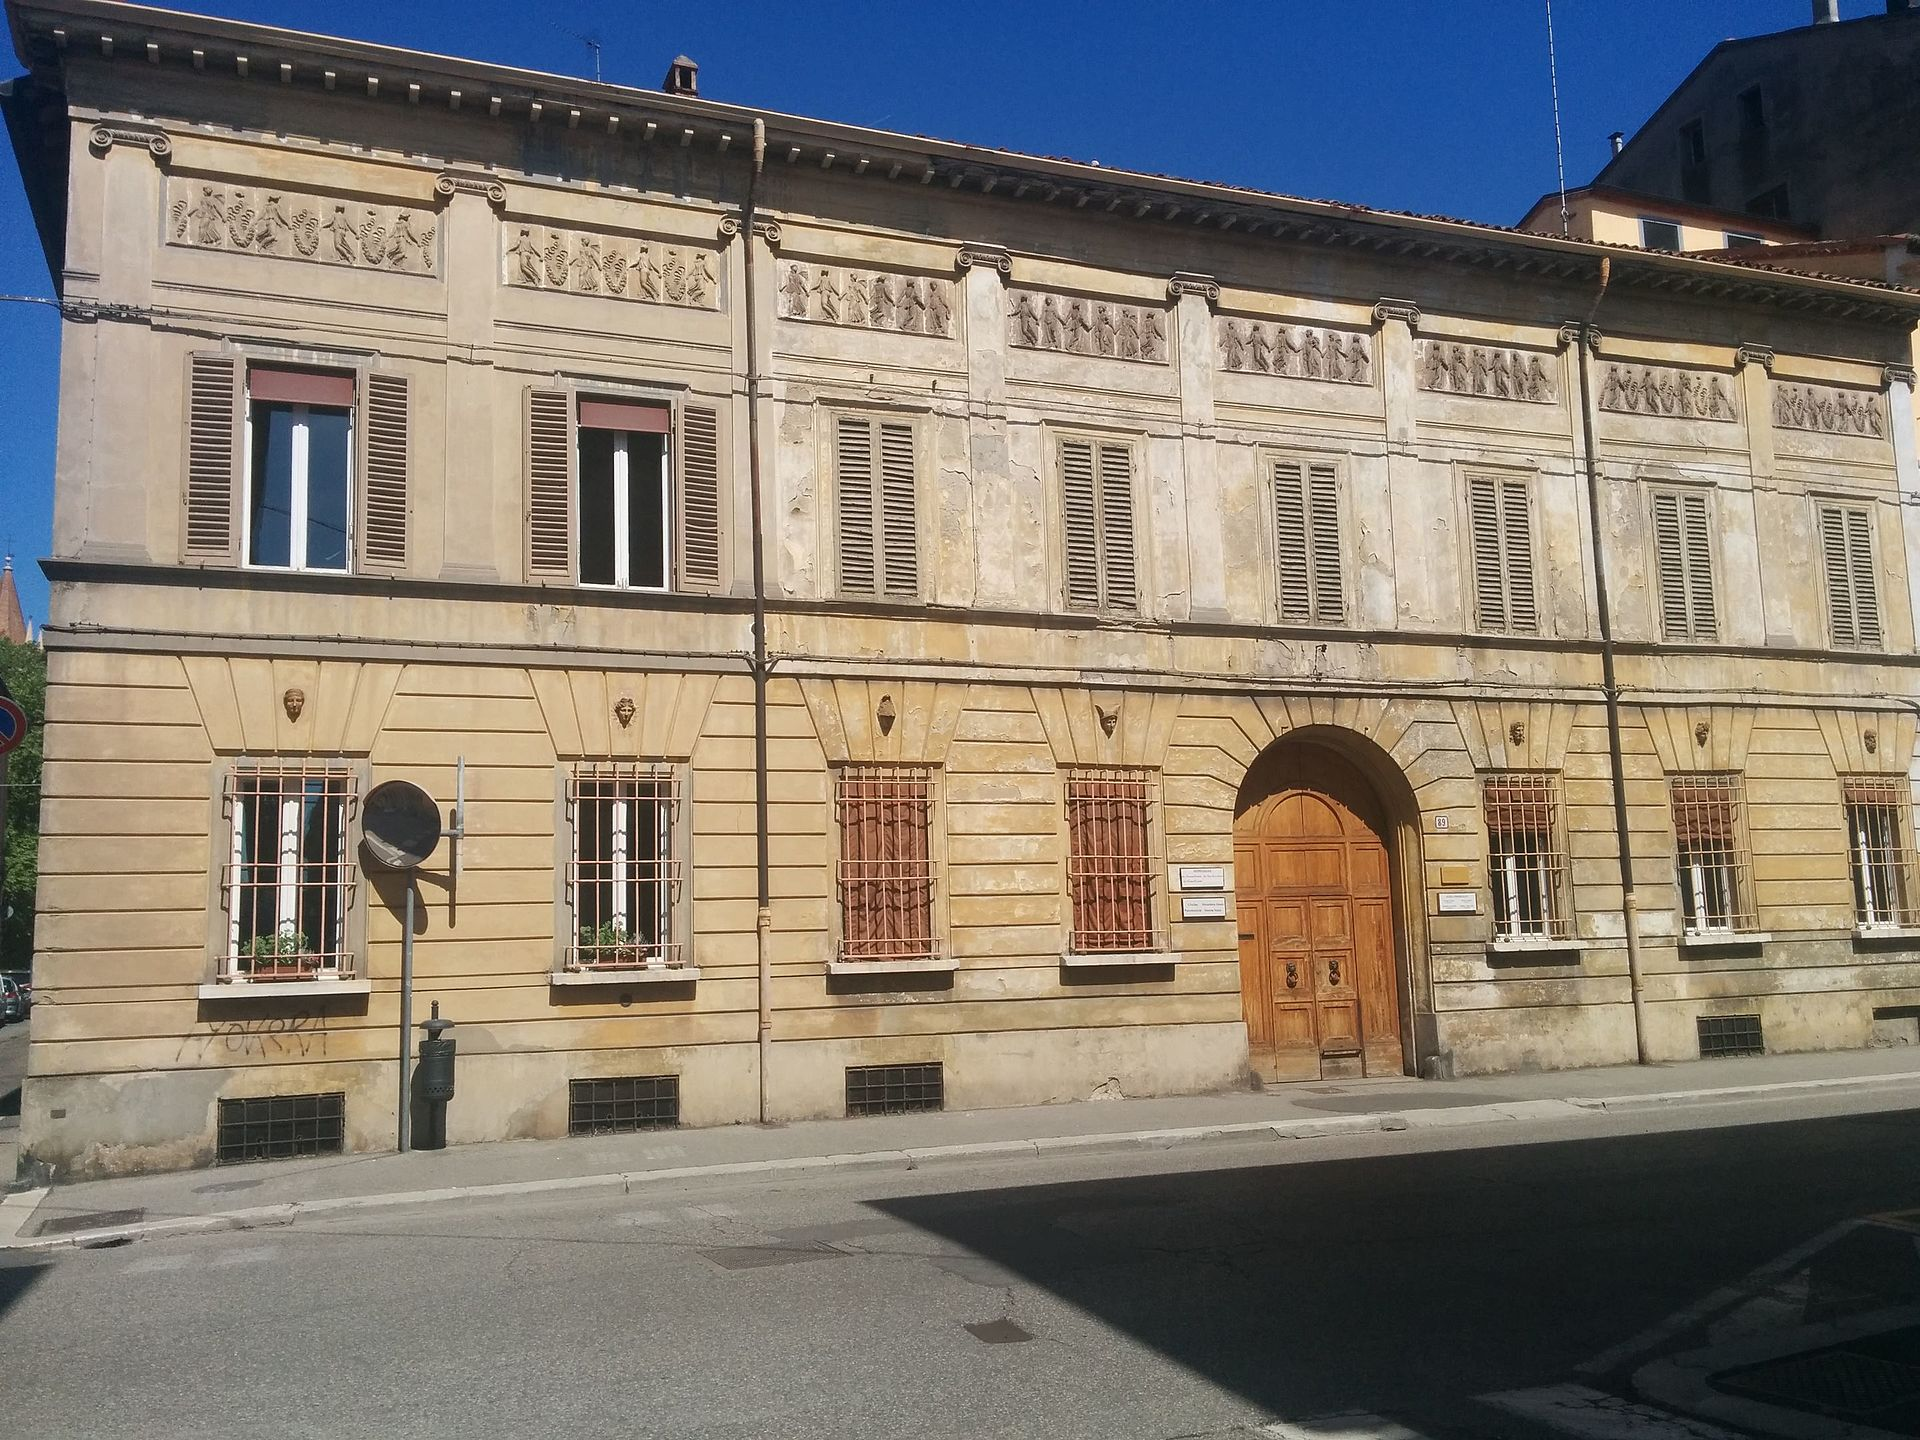 Casa piani wikipedia for Piani casa casa tudor